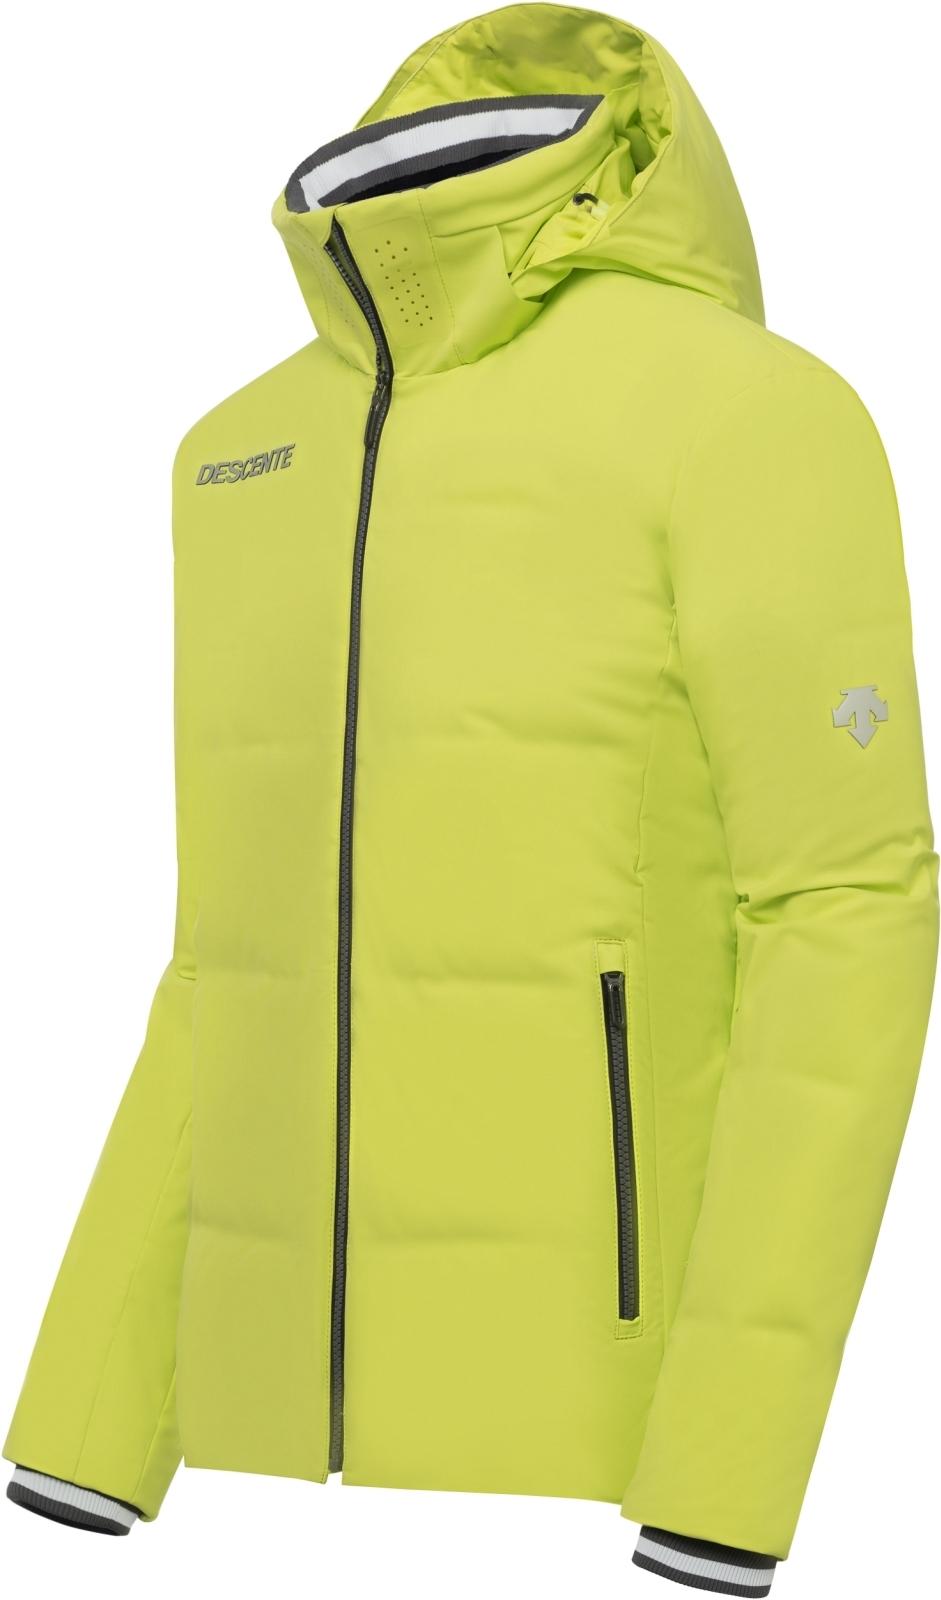 acdd71c3a29 Pánská péřová lyžařská bunda Descente Nilo - lime green - Ski a Bike ...